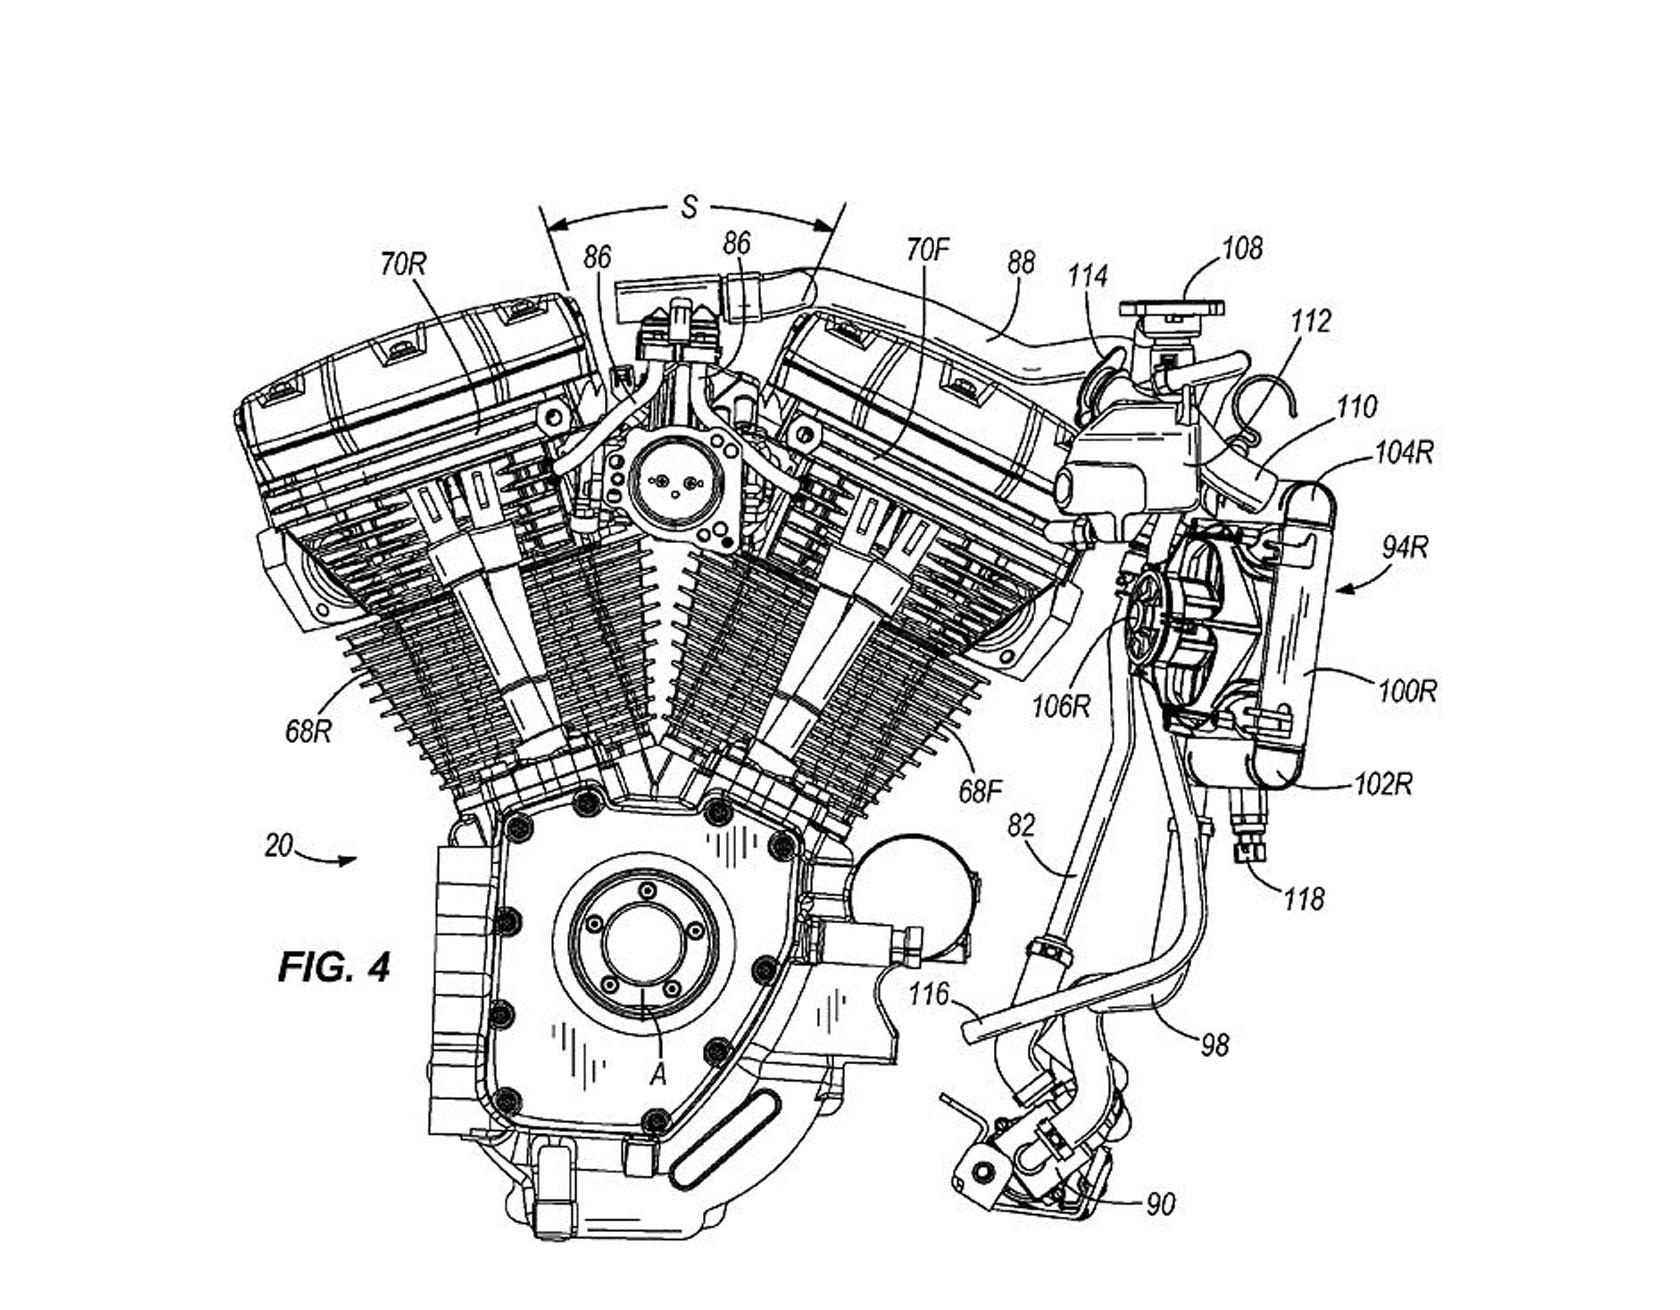 Harley Davidson Evolution Engine Diagram Evo Motorcycle Engine Diagram Of Harley Davidson Evolution Engine Diagram